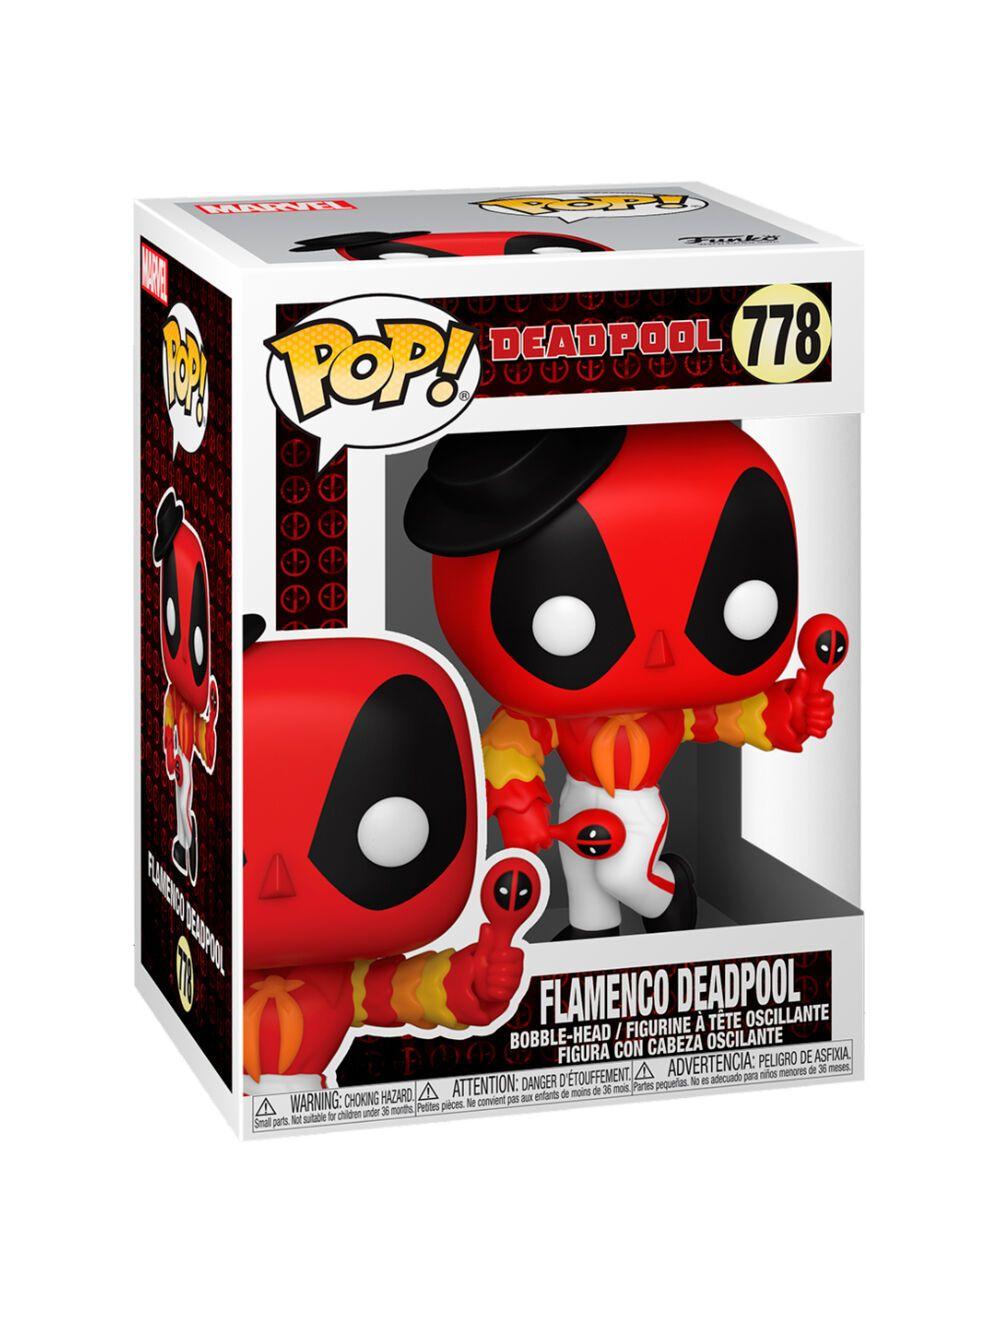 Funko POP! Deadpool 30th - Flamenco Deadpool Vinyl figura 10cm